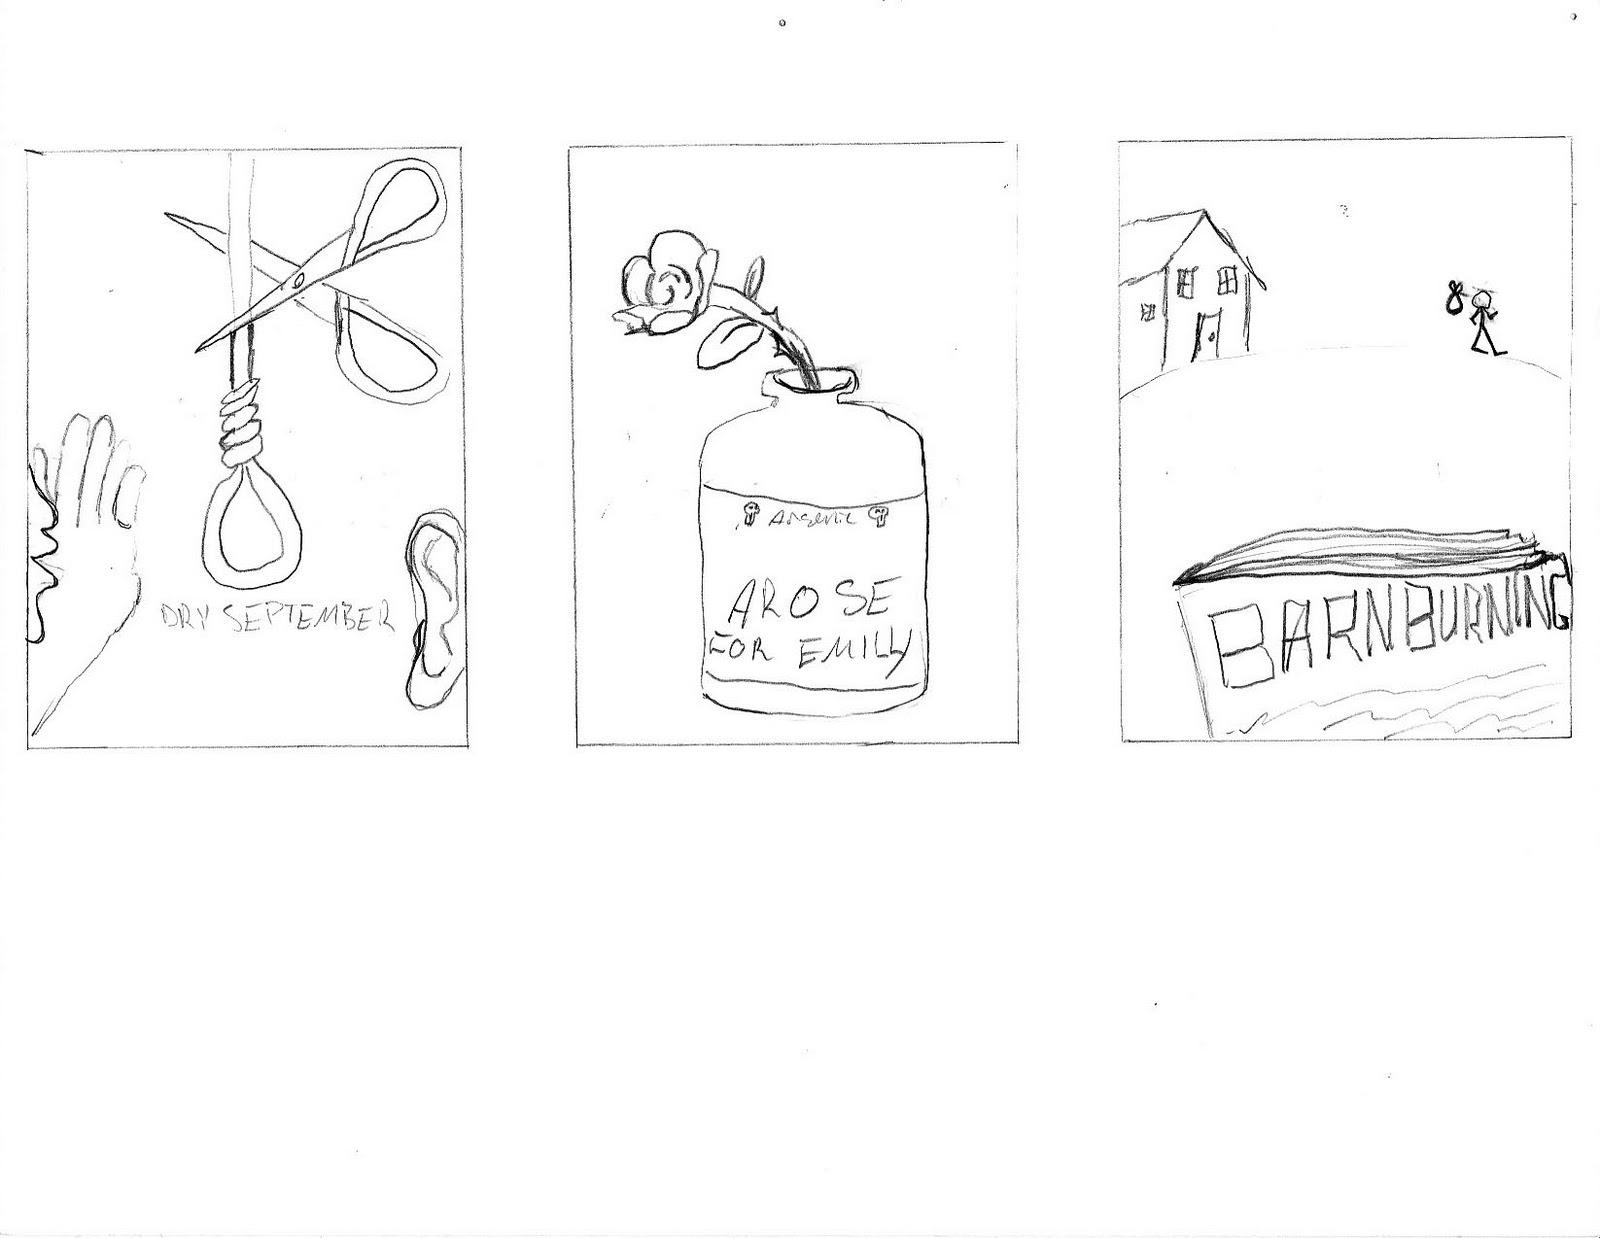 David White Design Process Blog: William Faulkner E Book ...